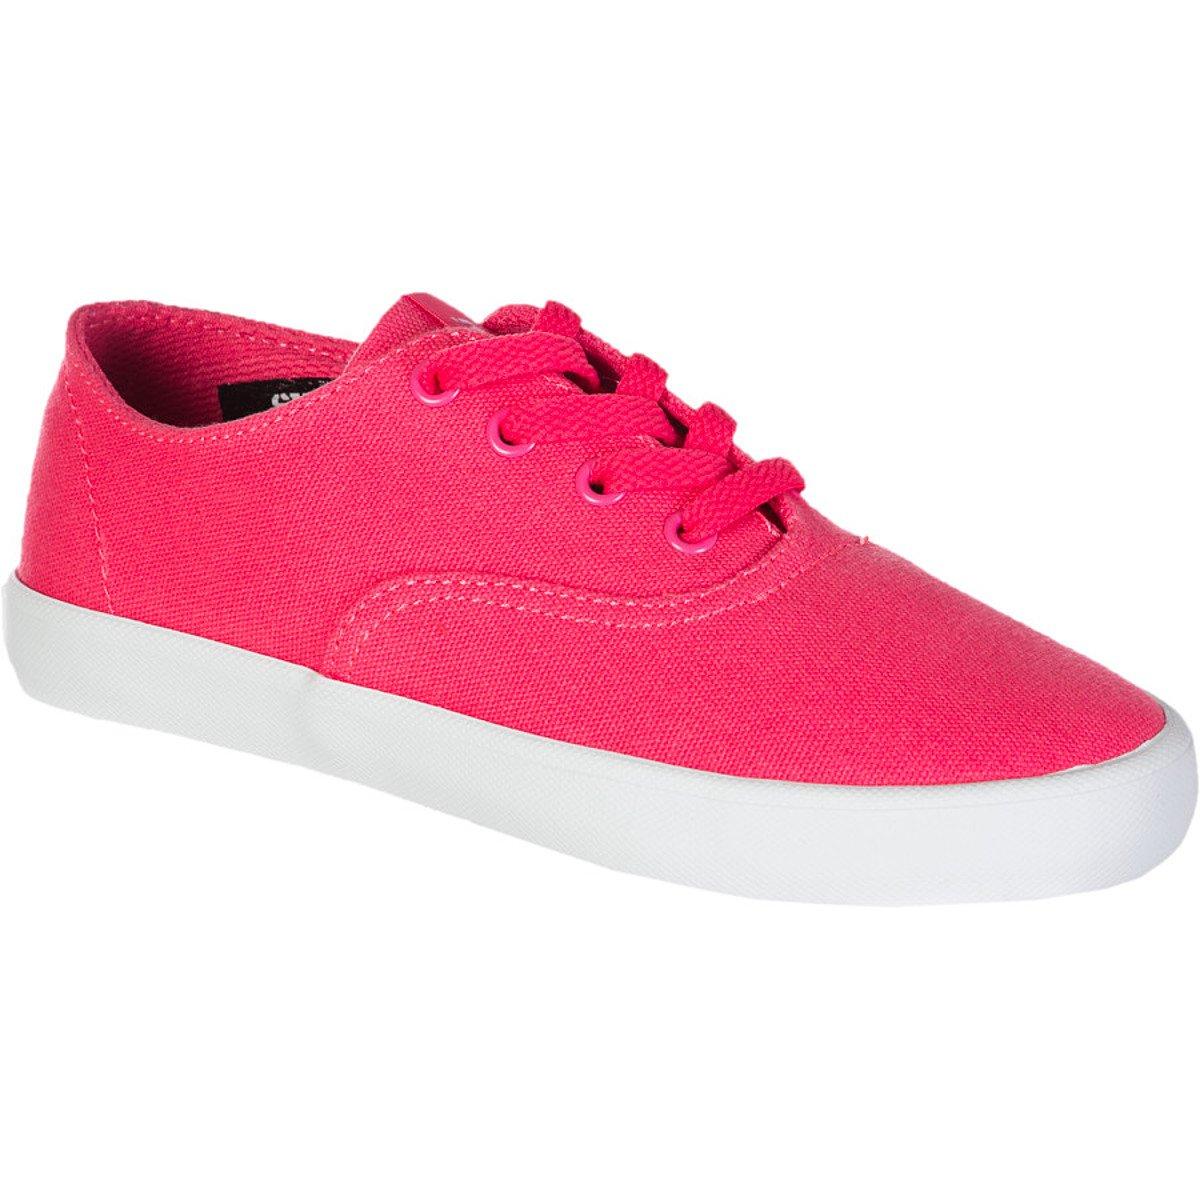 SUPRA WMNS Wrap Schuhe Damen Turnschuhe Turnschuhe Rosa SW05001